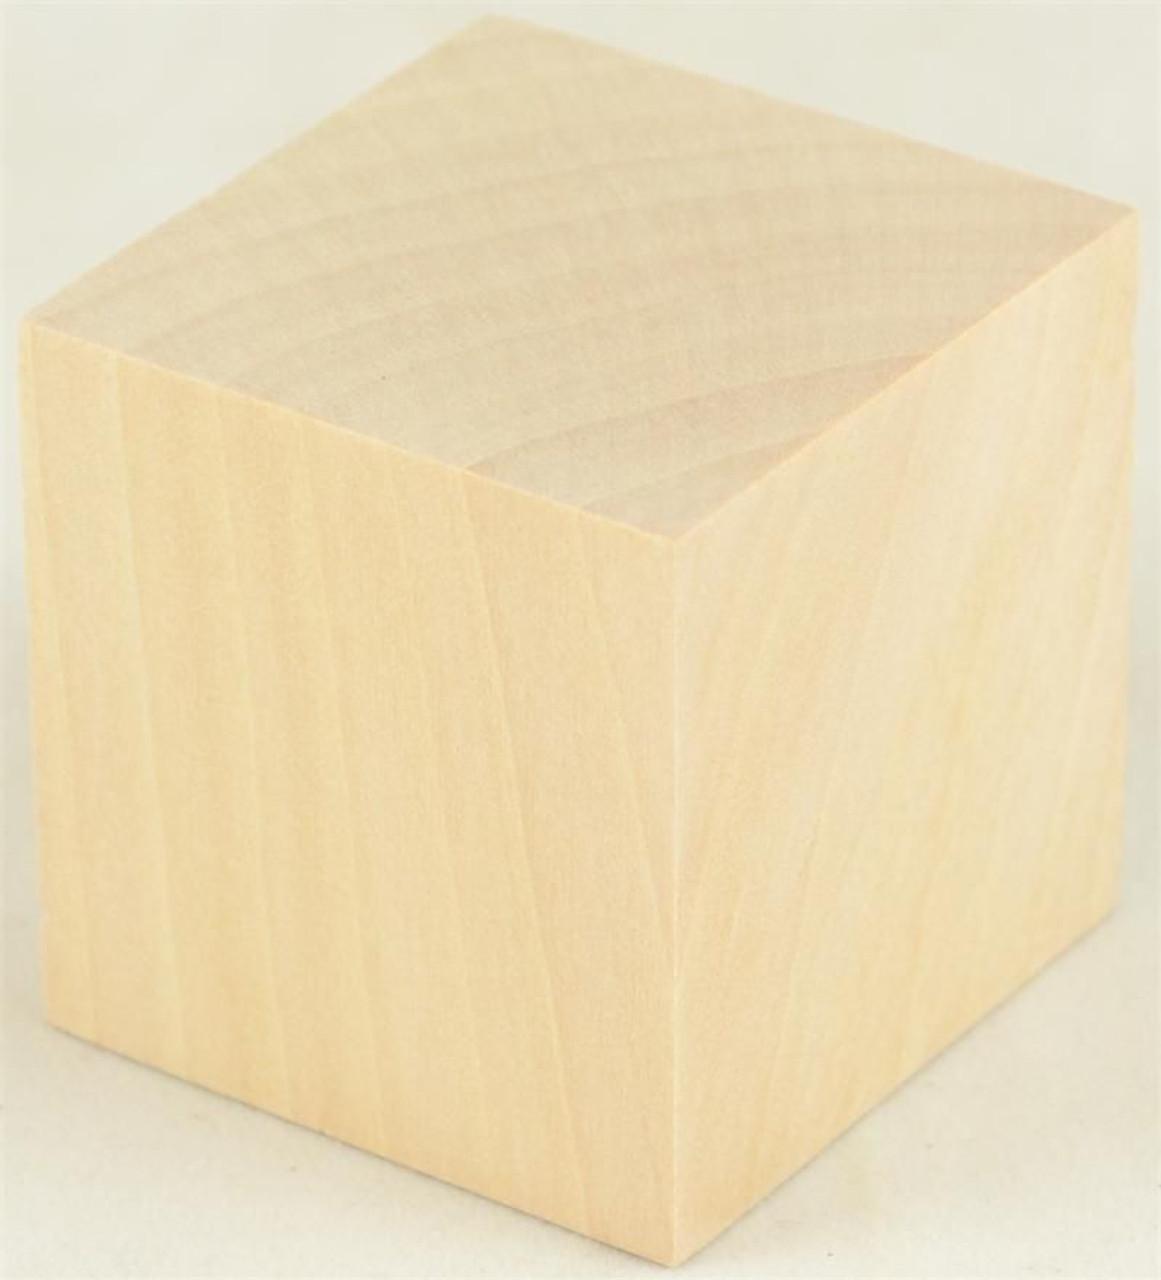 Wooden Cubes 34 Hardwood Blocks Sold In Lots Of 100